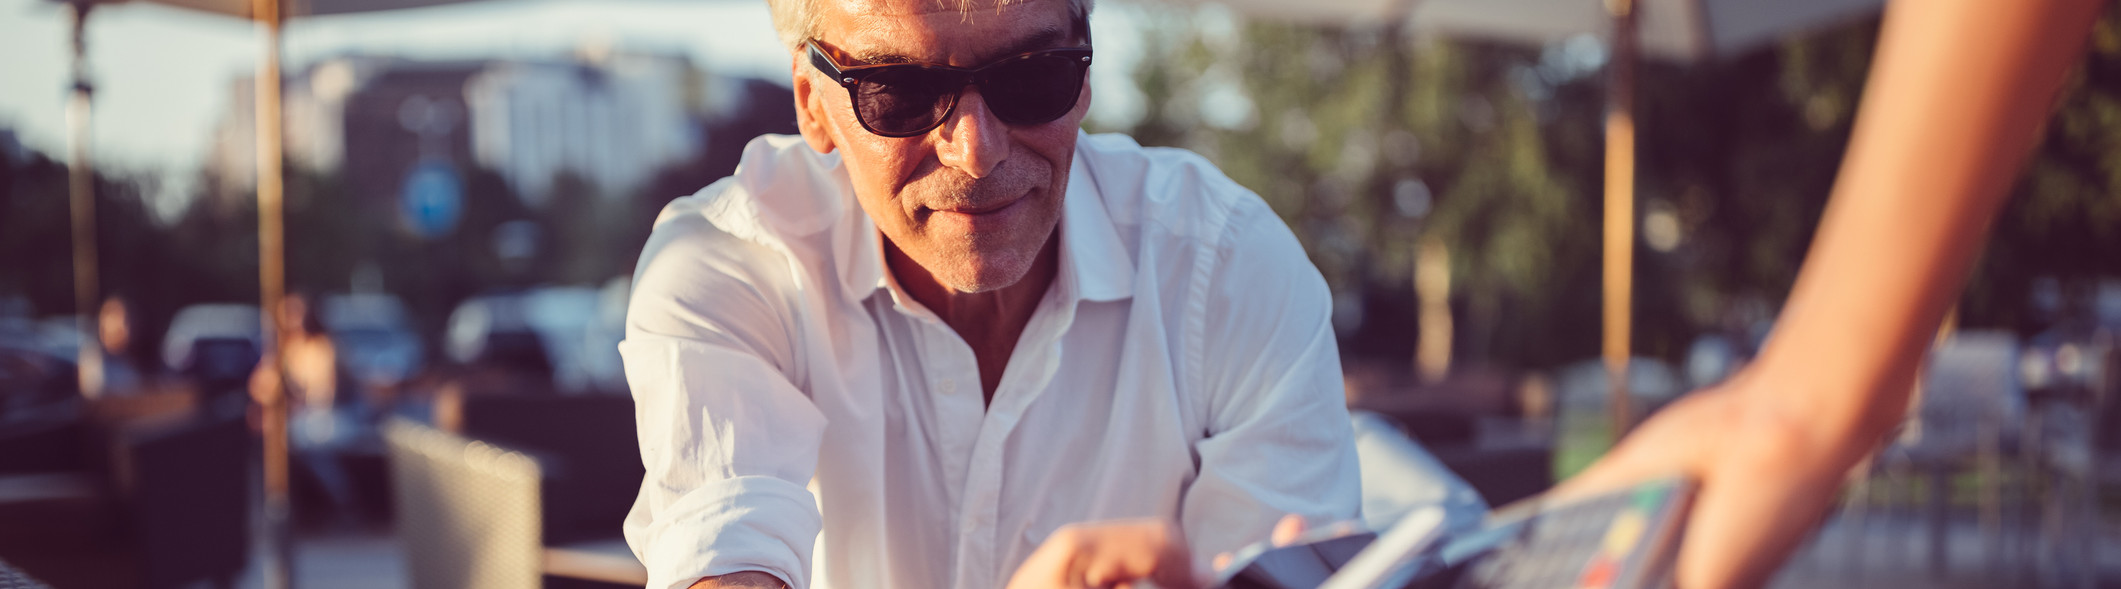 senior man using mobile payment